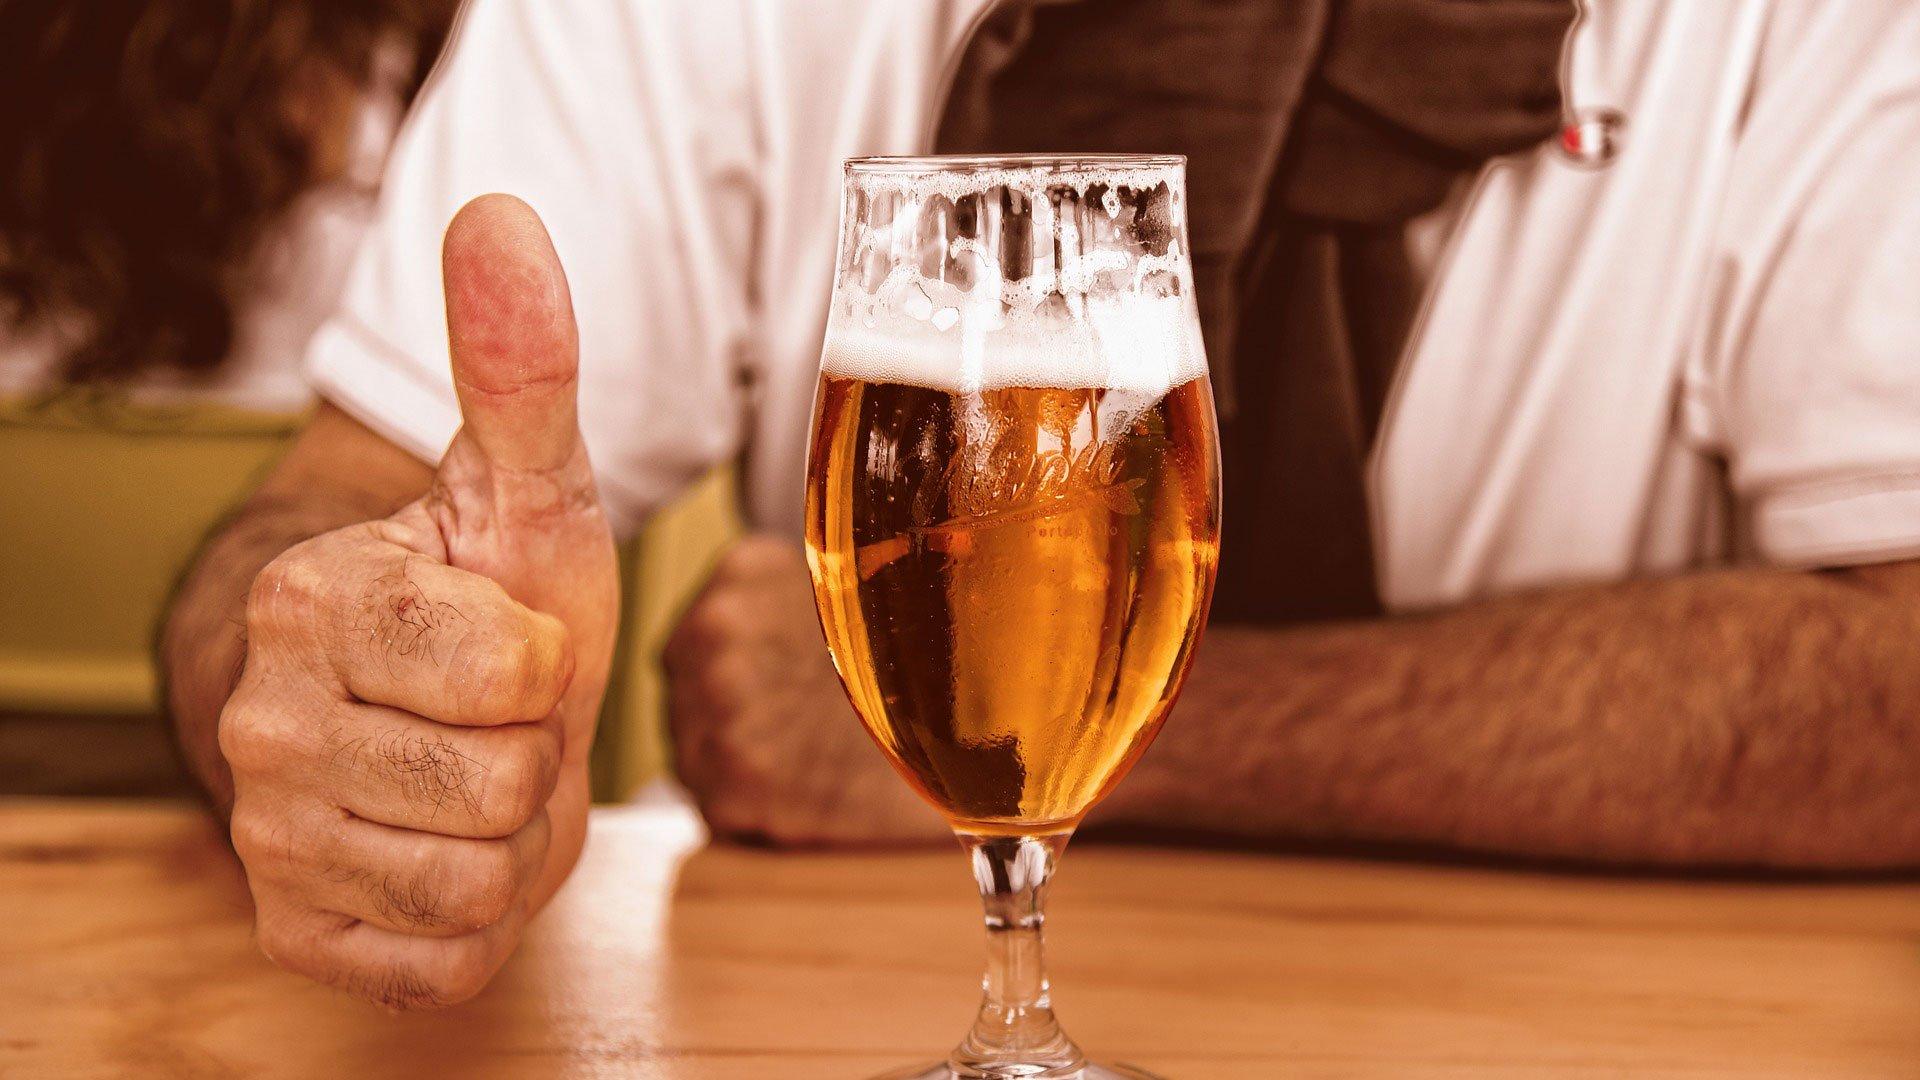 Влияет ли пиво на суставы?